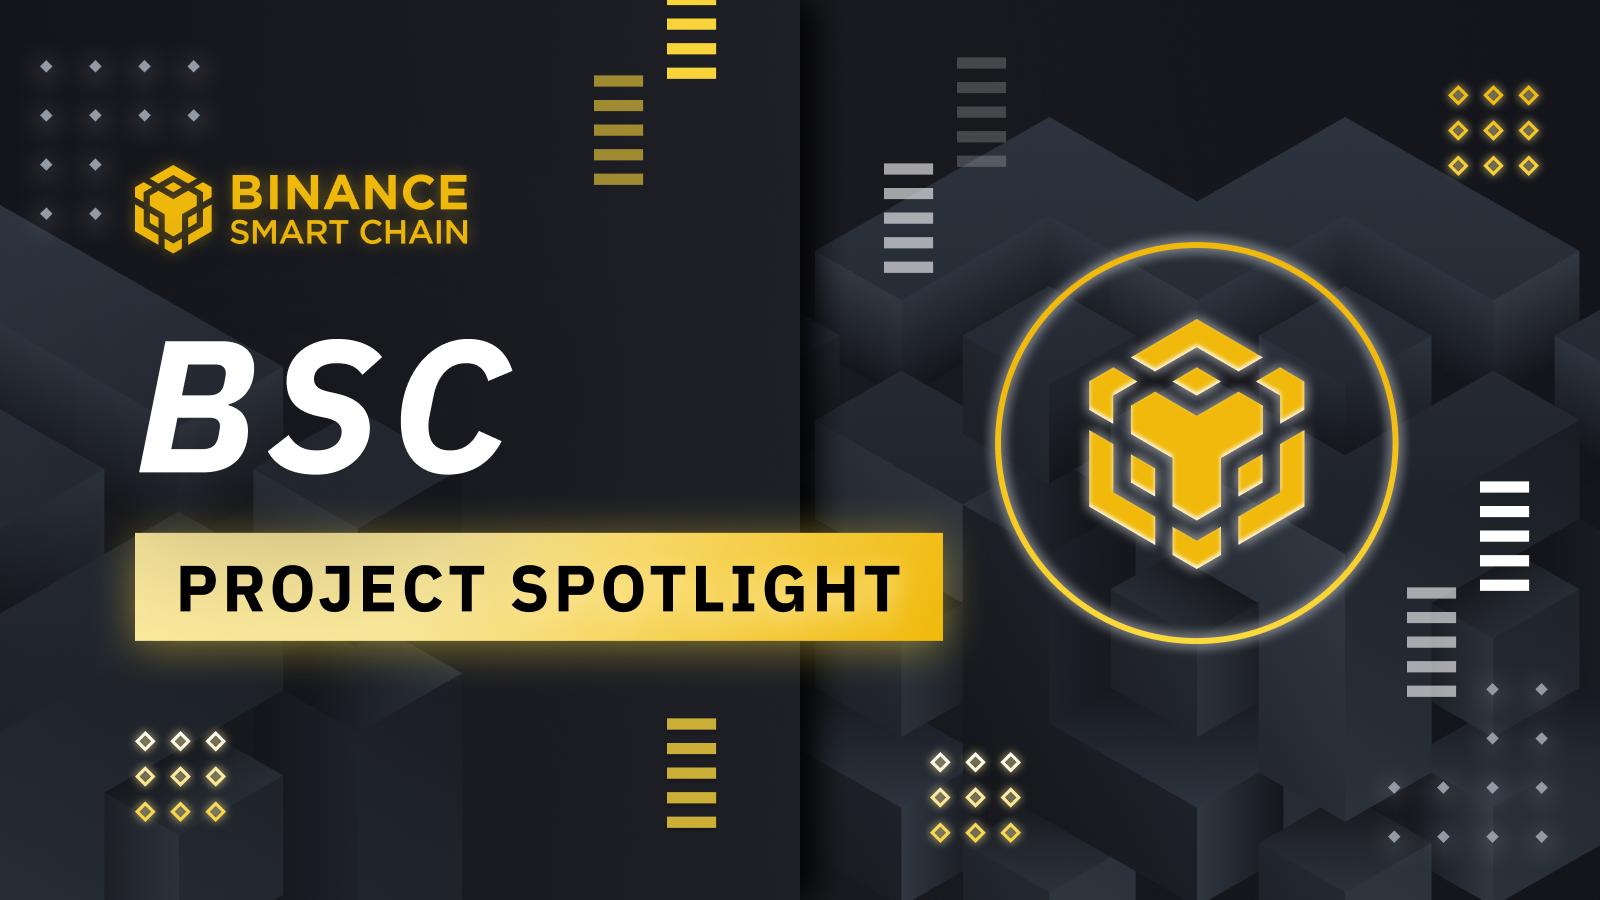 BSC Project Spotlight: BunnyPark